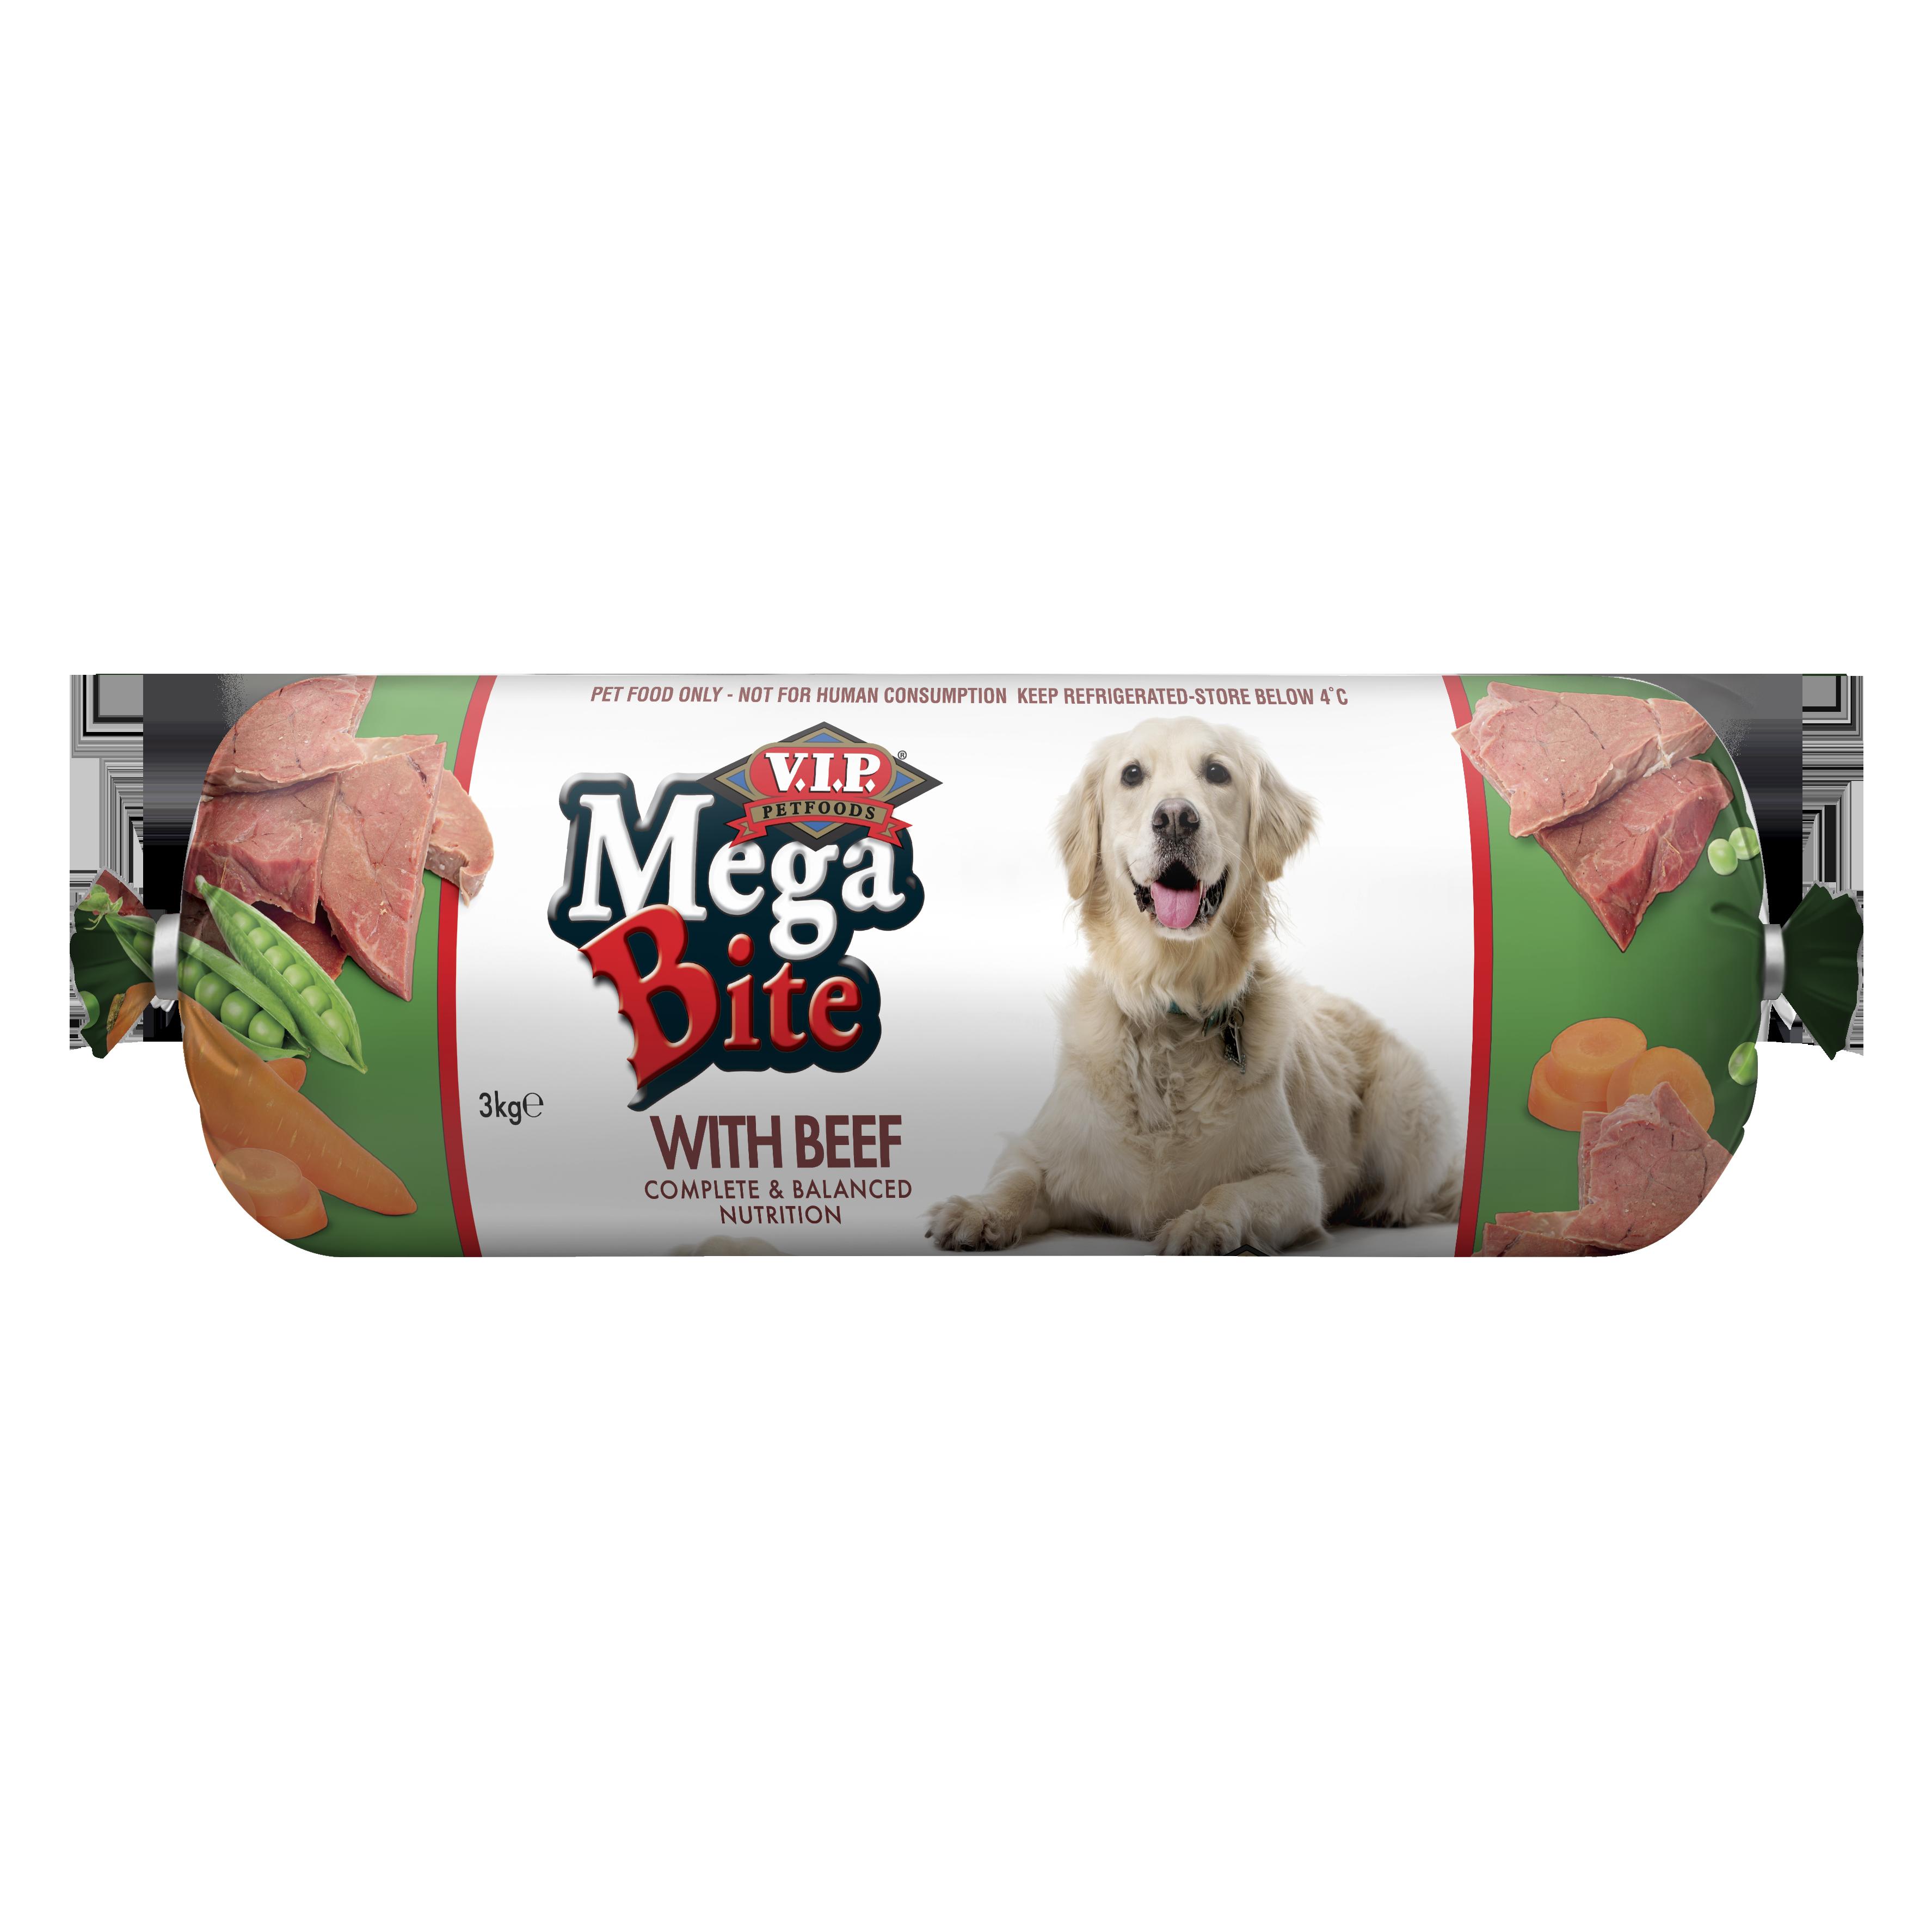 V.I.P. Petfoods | Mega Bite with Prime Beef 3kg | Chilled tray | Front of pack